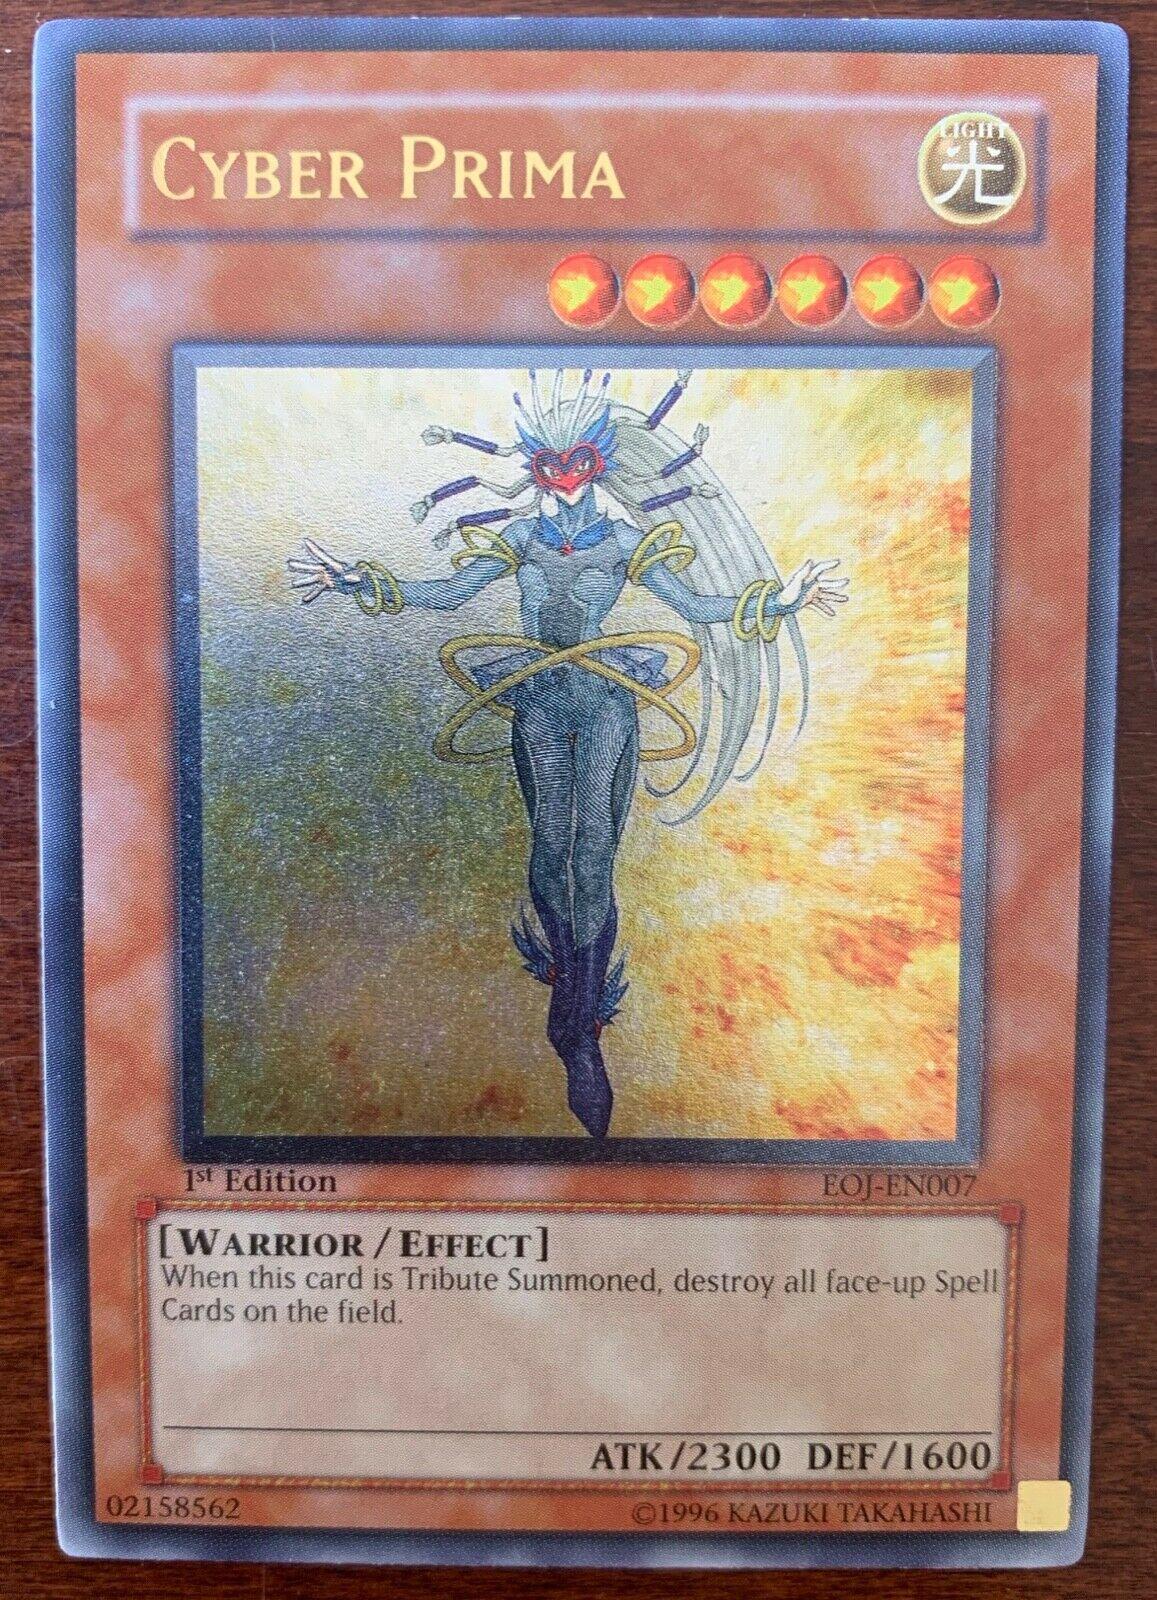 Yugioh Cyber Prima EOJ-EN007 1st Edtion MINT Super Rare